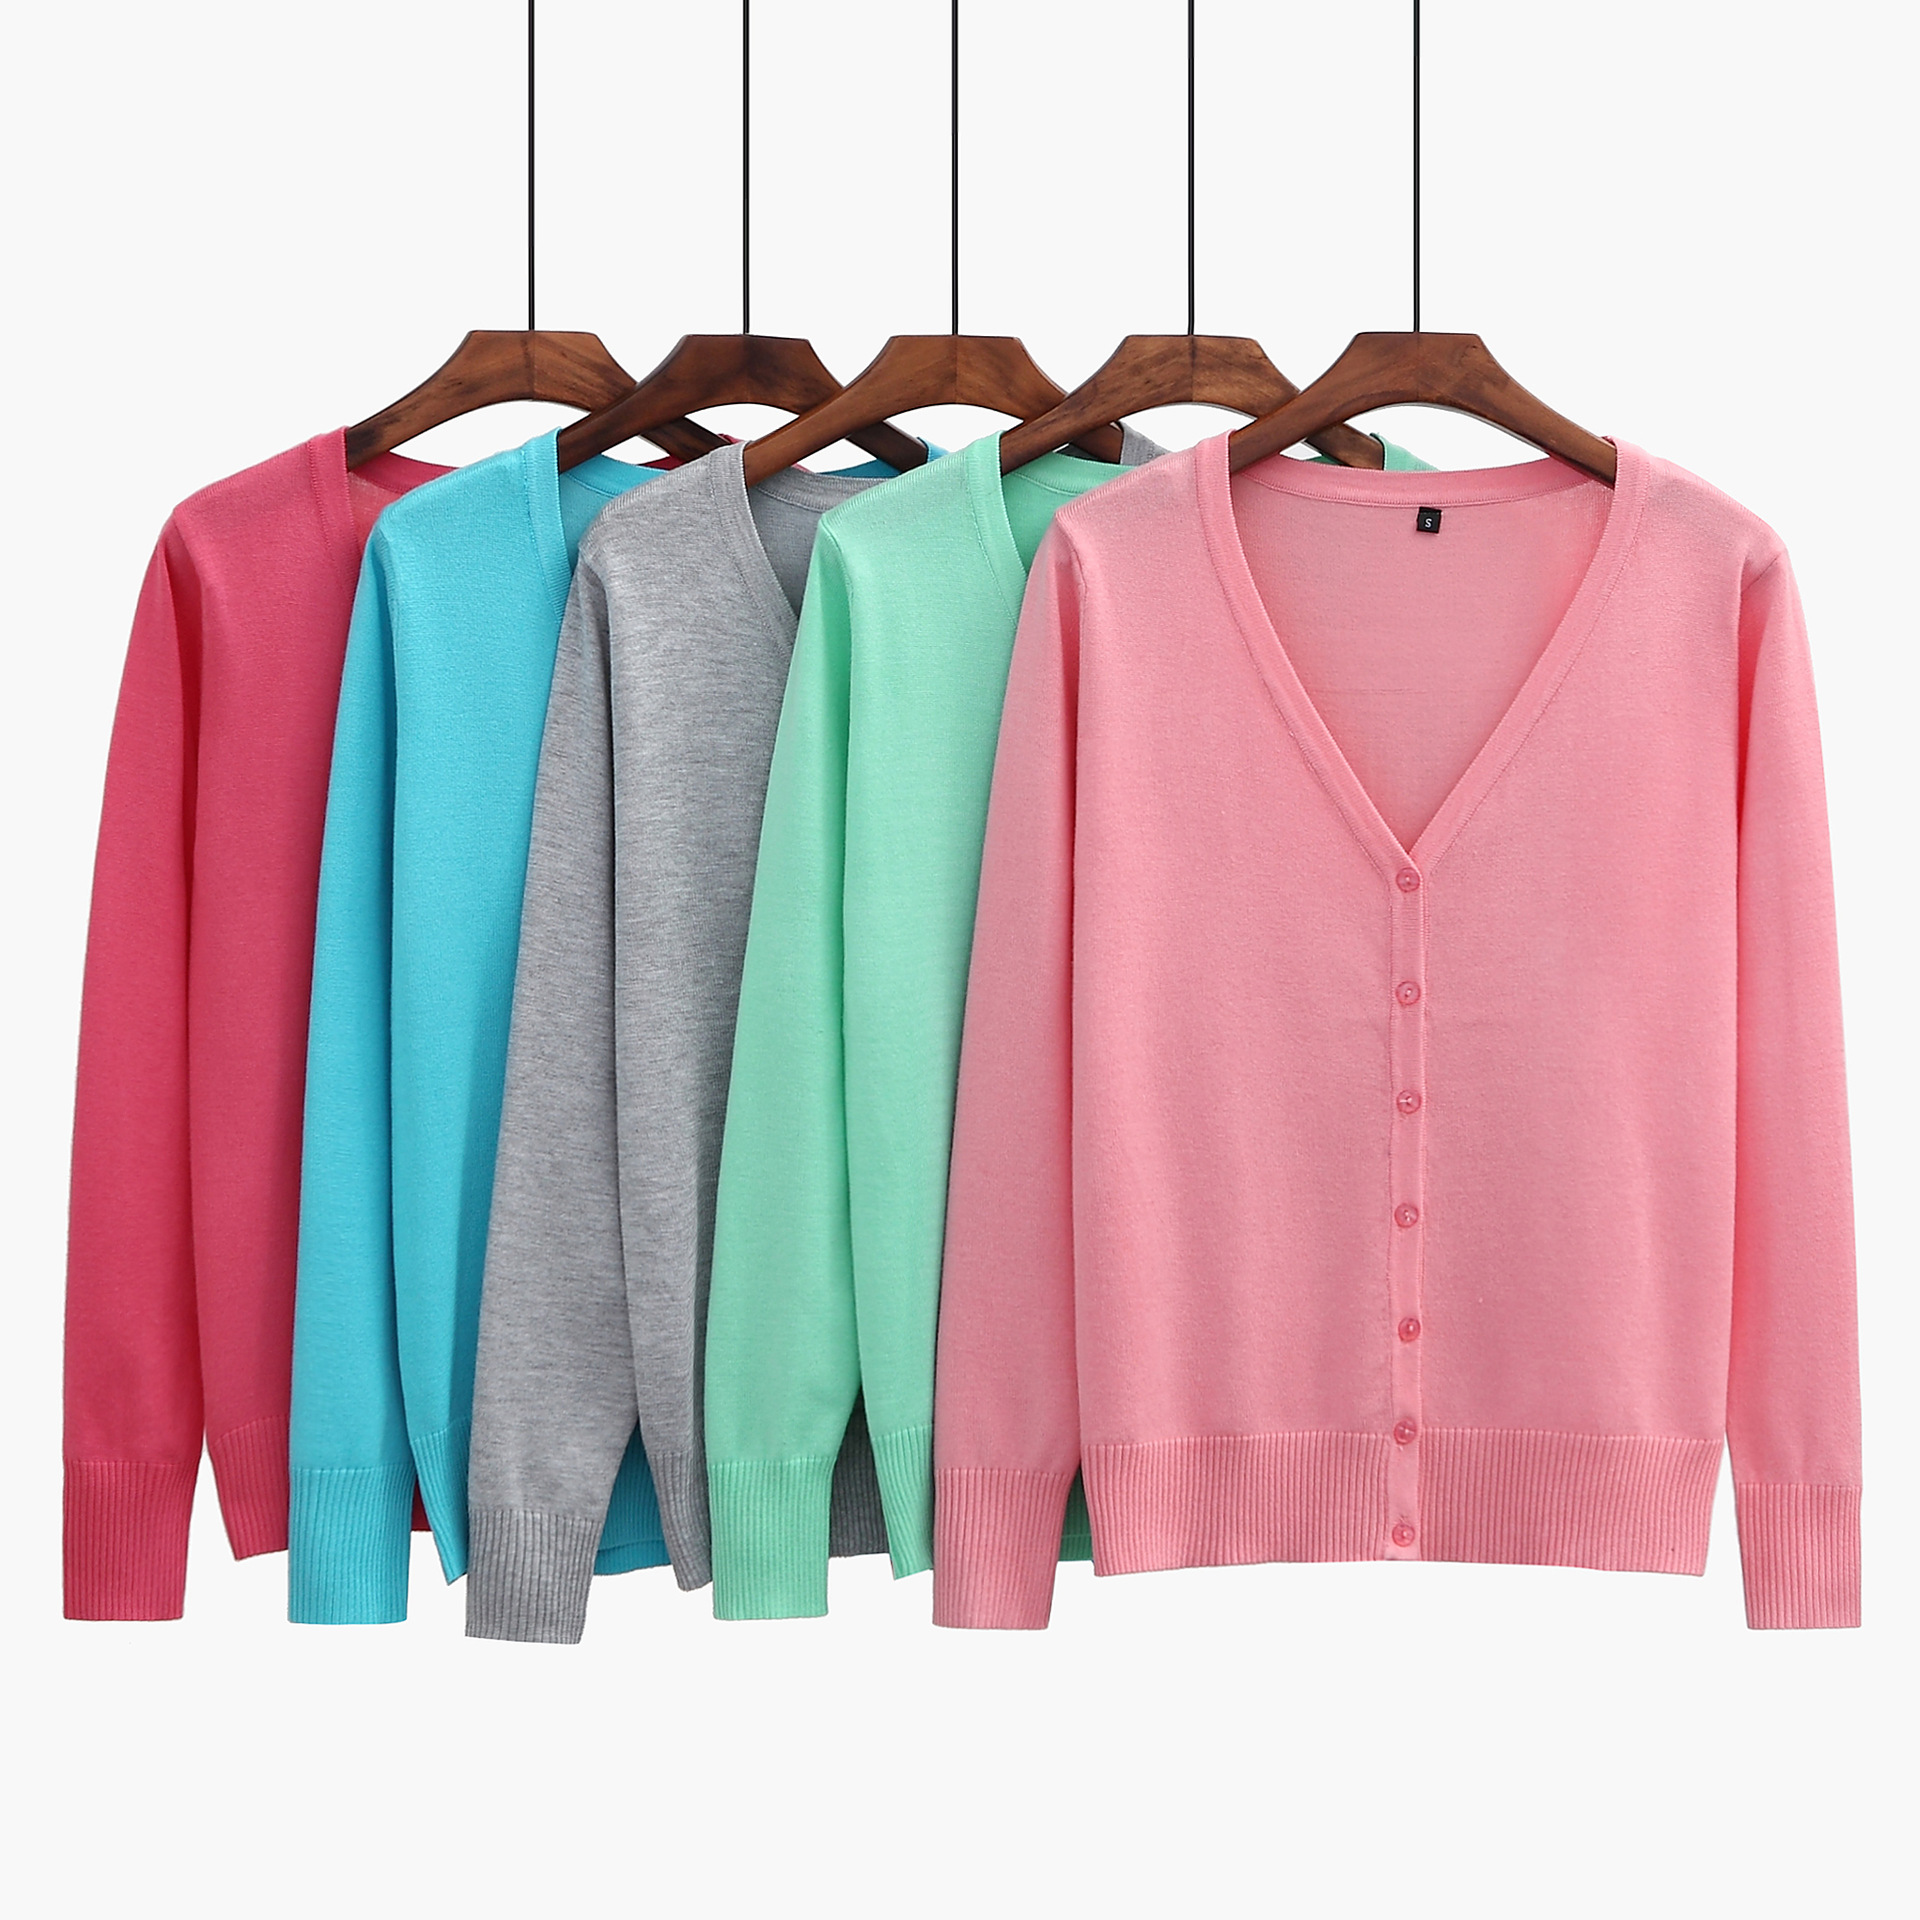 Womens wear spring and autumn 2021 new Korean slim thin knitwear plus extra large cardigan big collar sweater